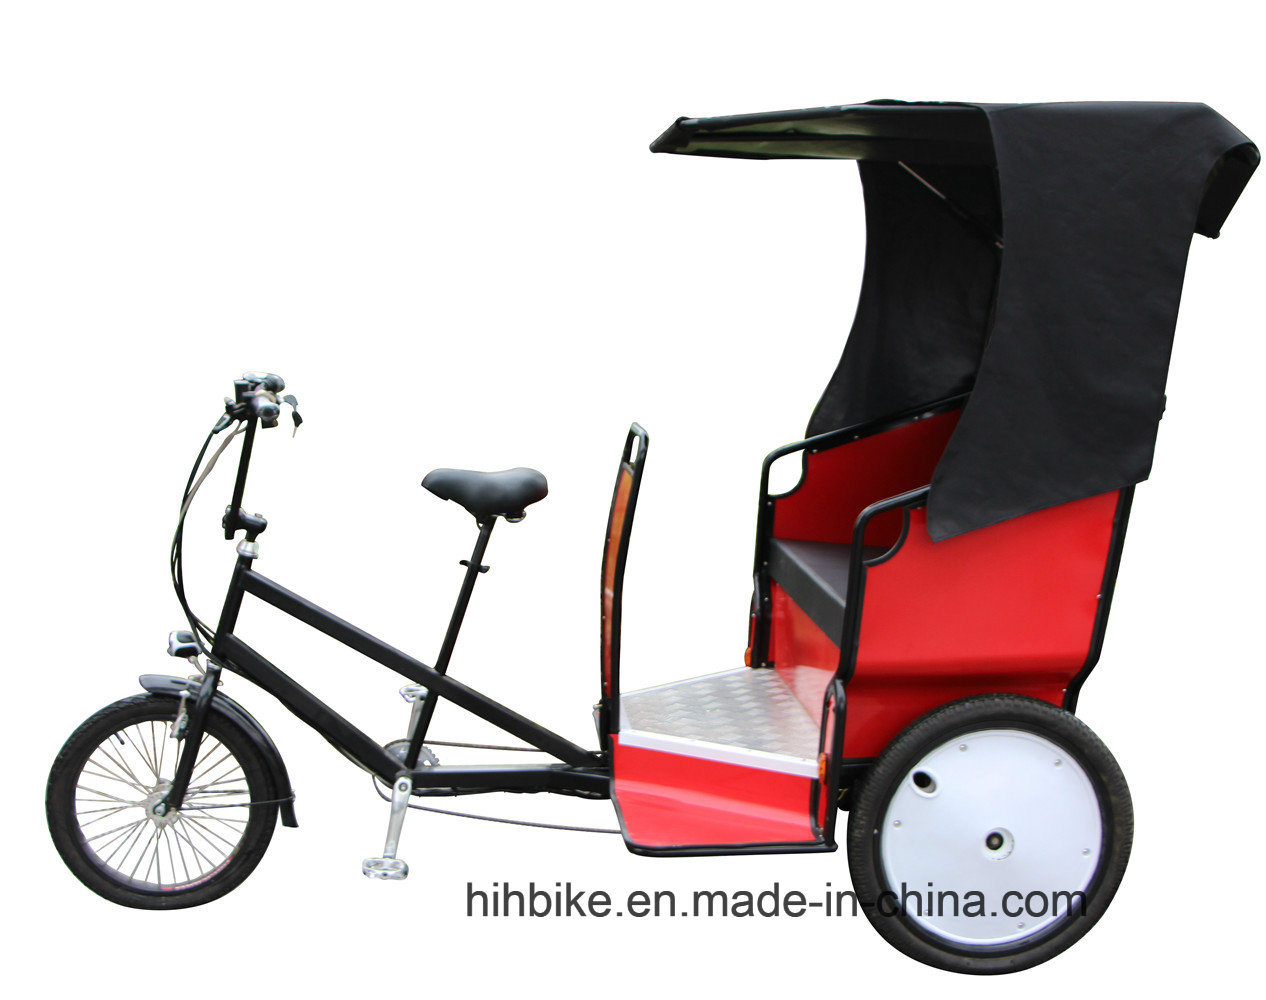 Renting Rickshaws with OEM Service